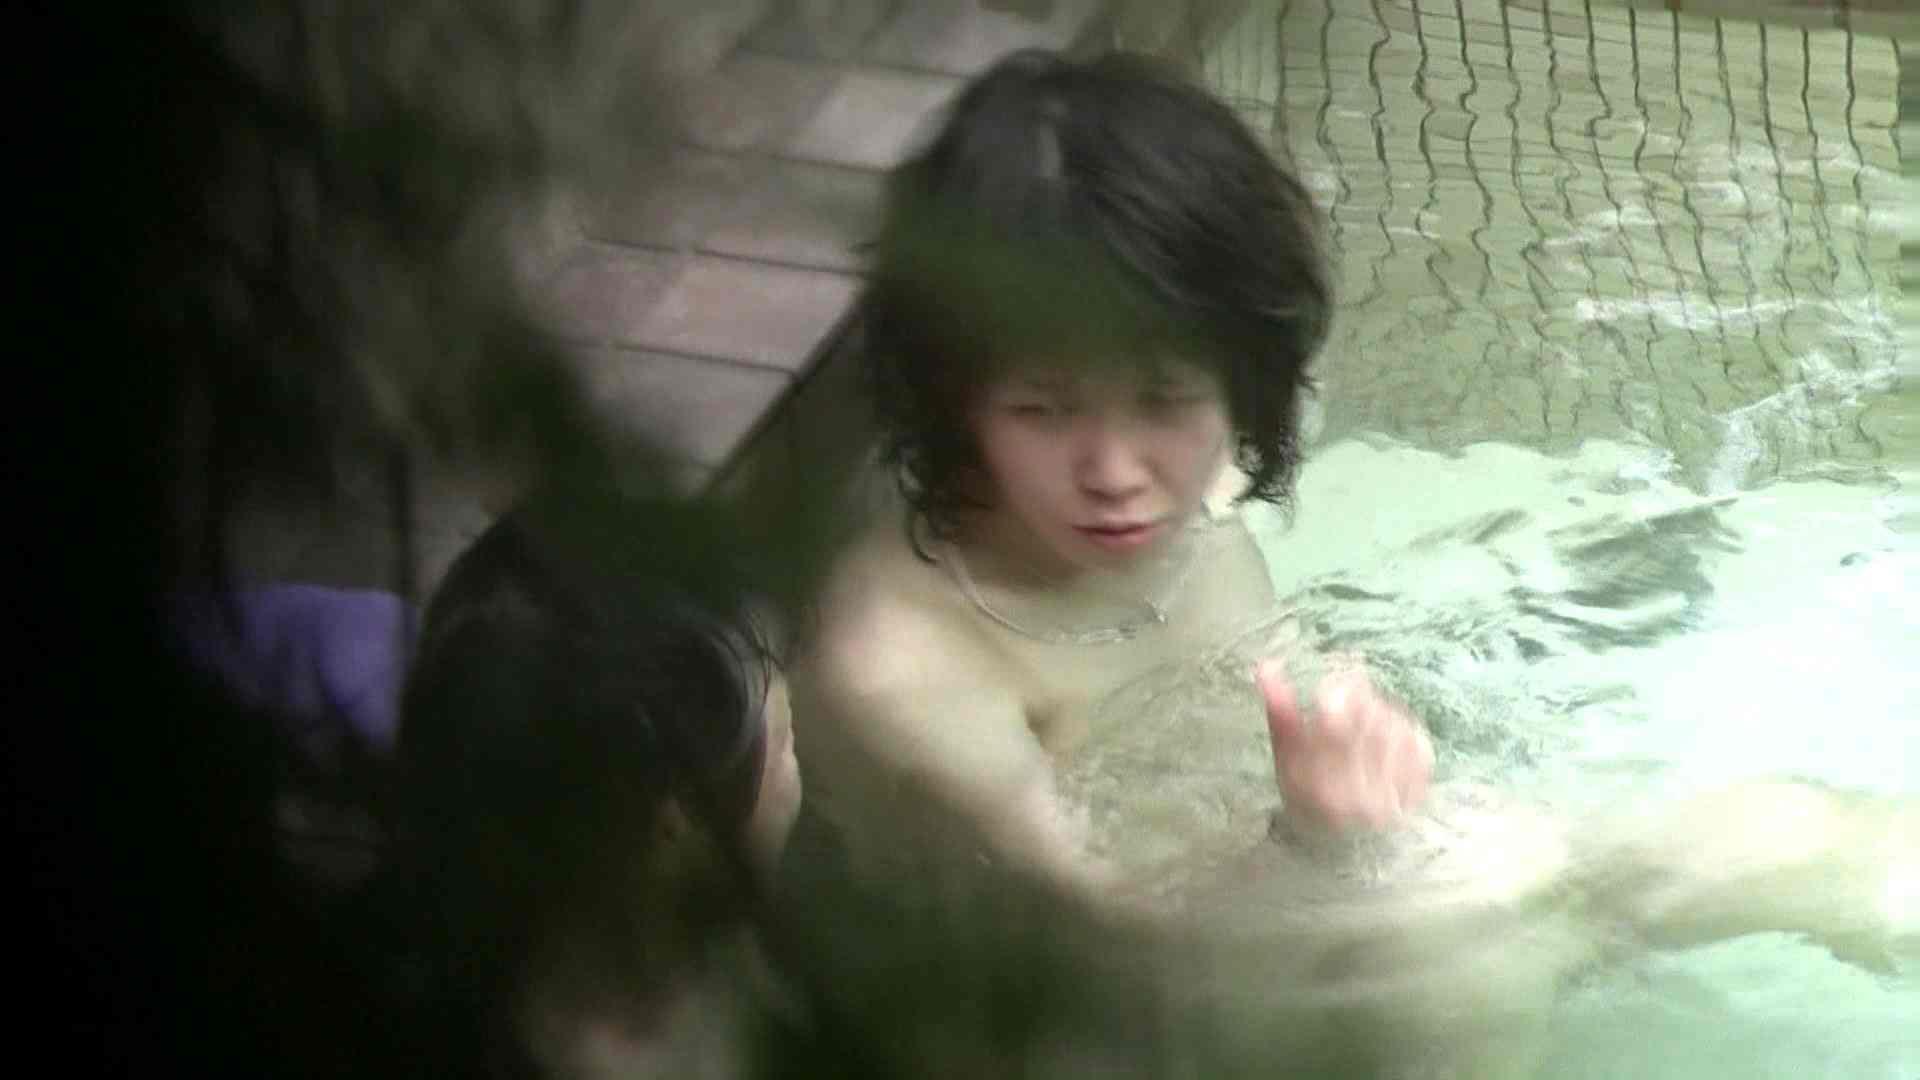 Aquaな露天風呂Vol.655 盗撮師作品 AV無料 72pic 32